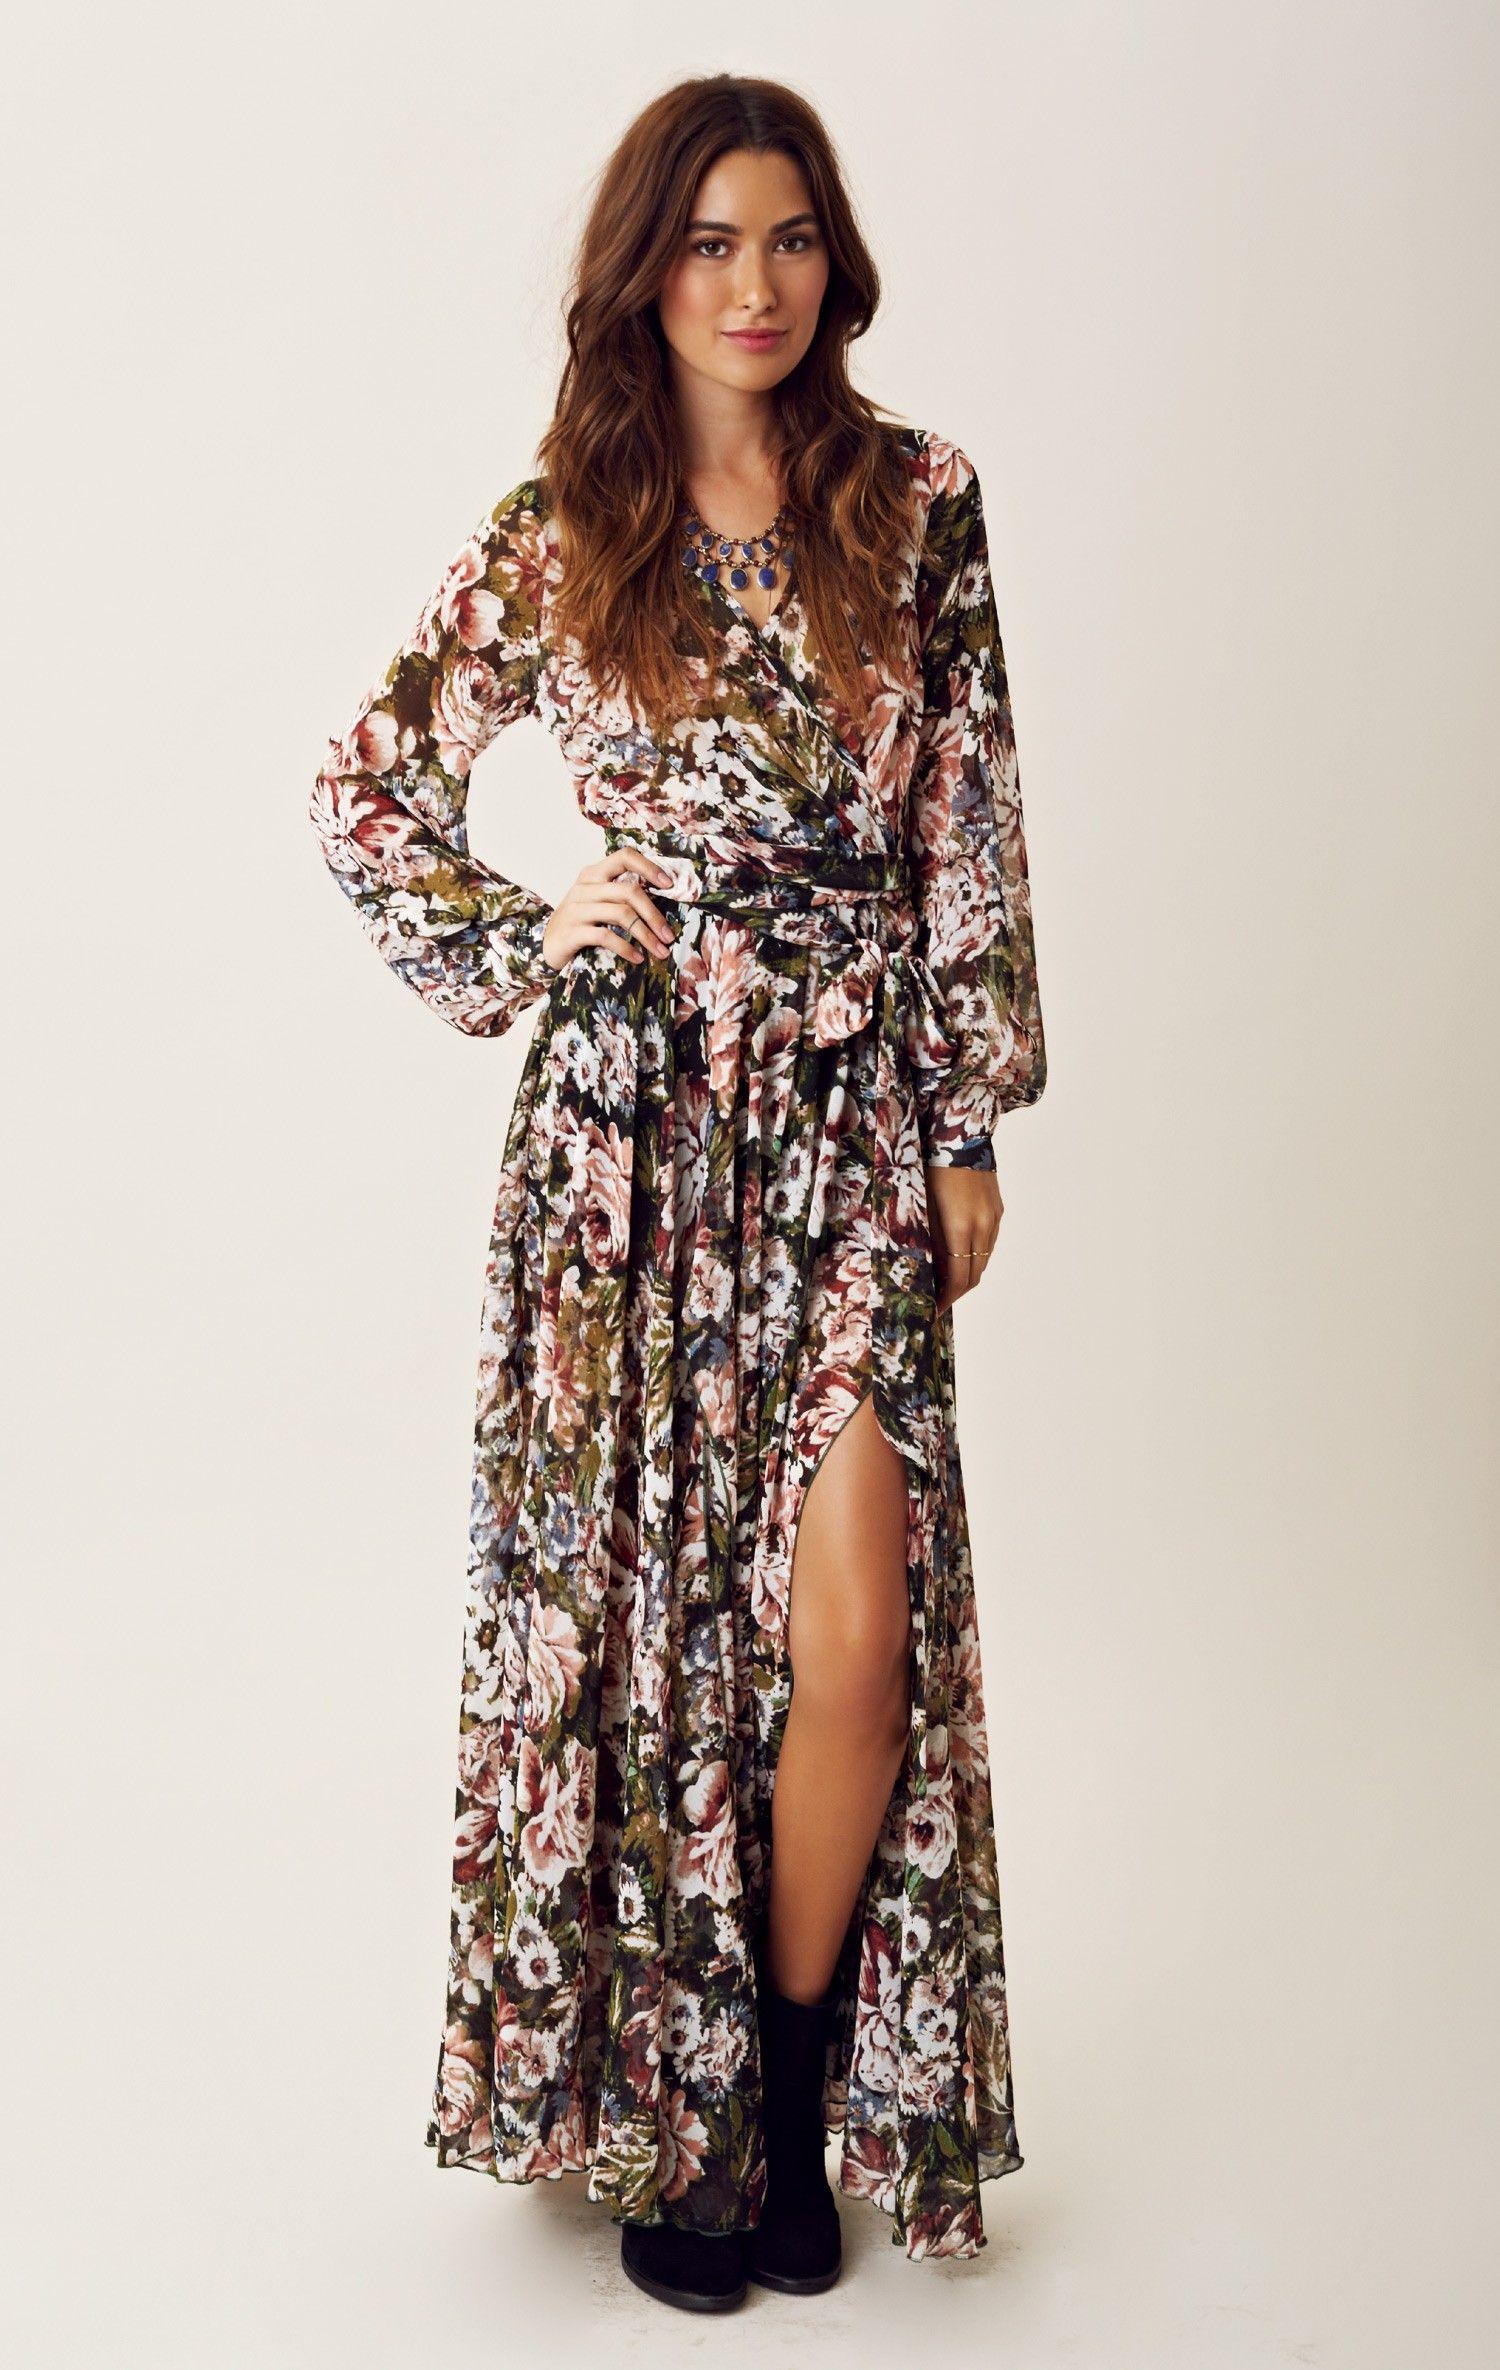 e7ac8a8890f5 Western Romance Maxi Dress | Bohemian Looks | Dresses, Fashion ...